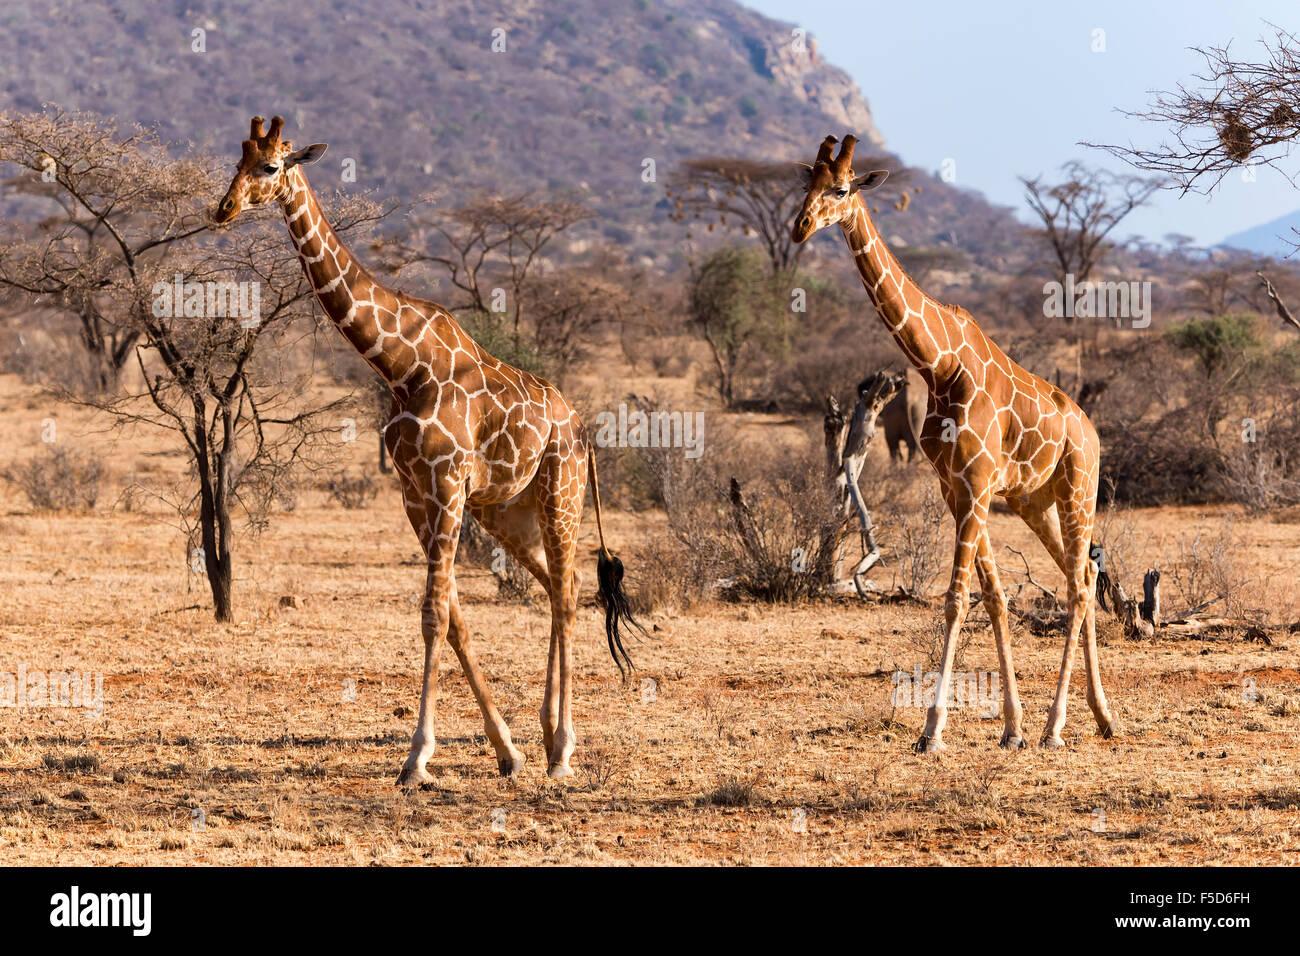 Les Girafes réticulée ou Somali girafes (Giraffa camelopardalis reticulata) tourne, la réserve nationale de Samburu, Kenya Banque D'Images